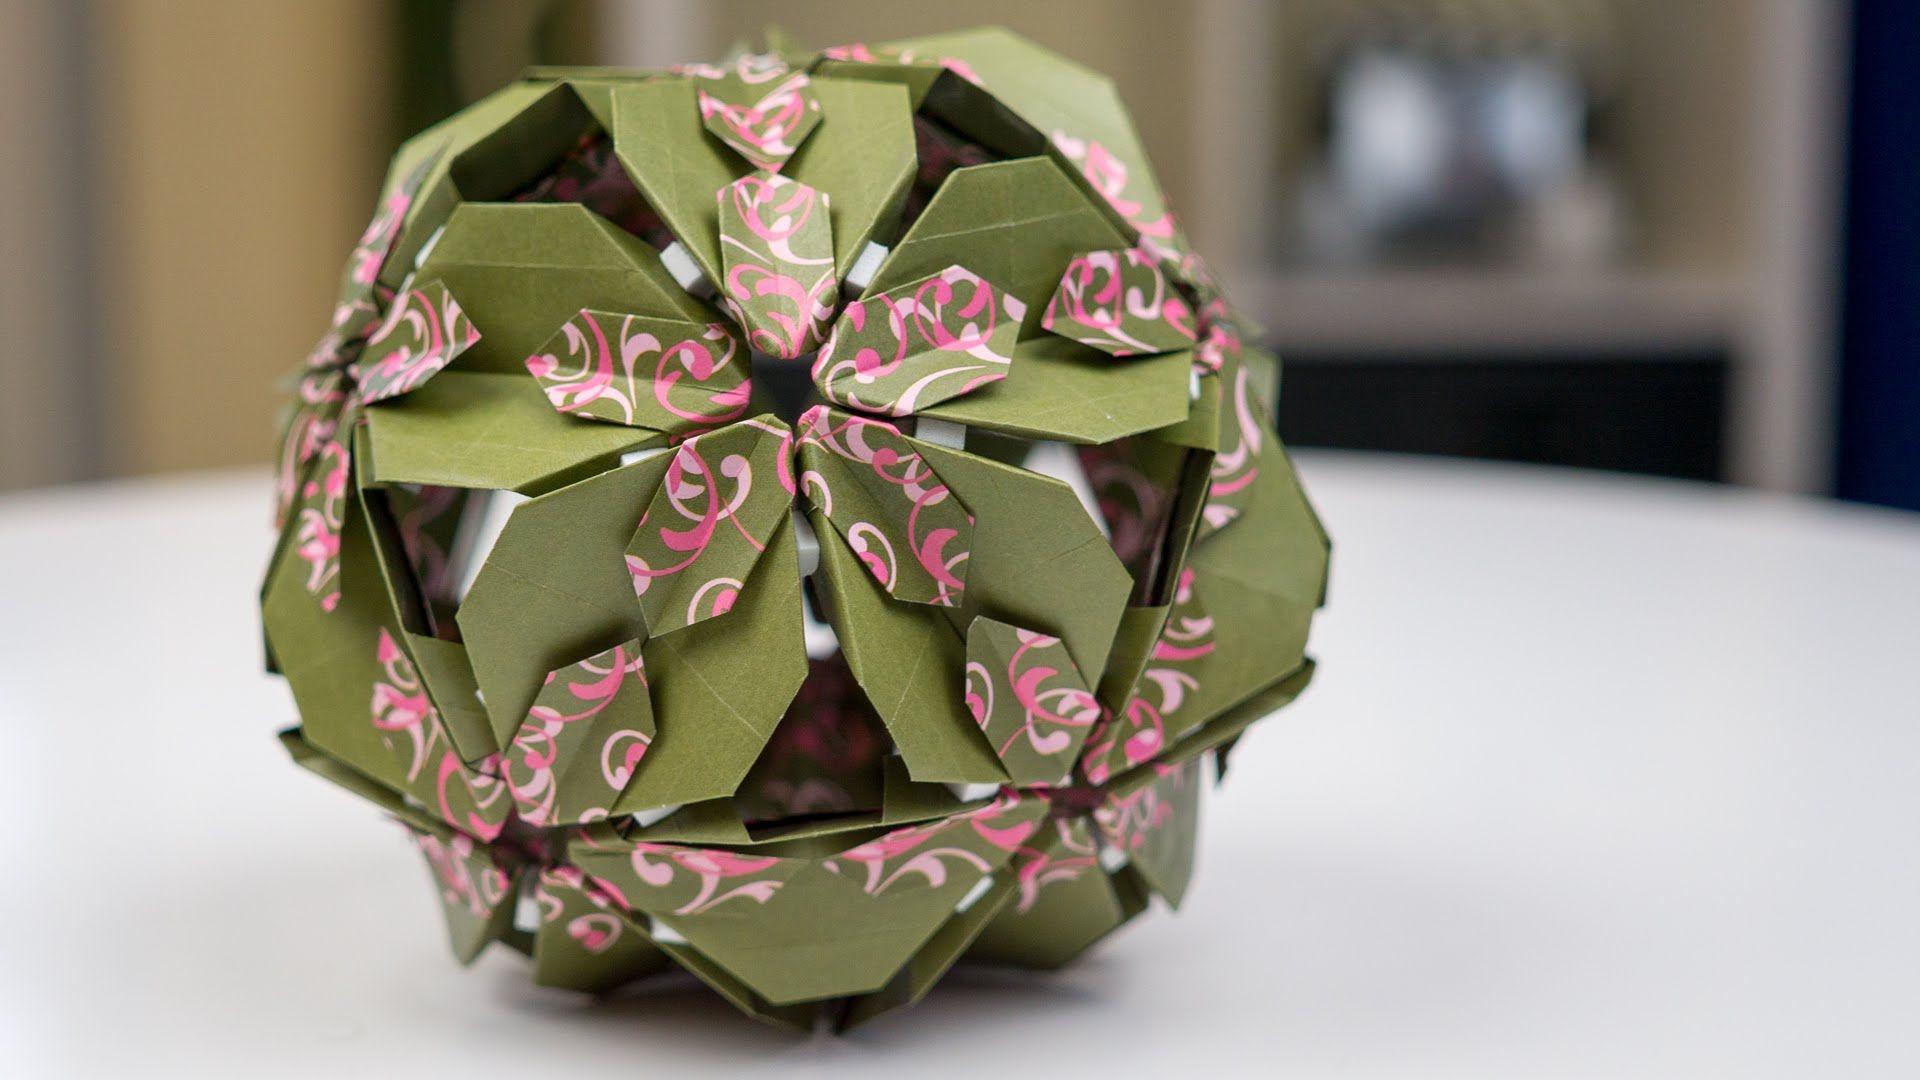 Basteln Mit Papier Origami Bltenkugel Falten Origami Palle